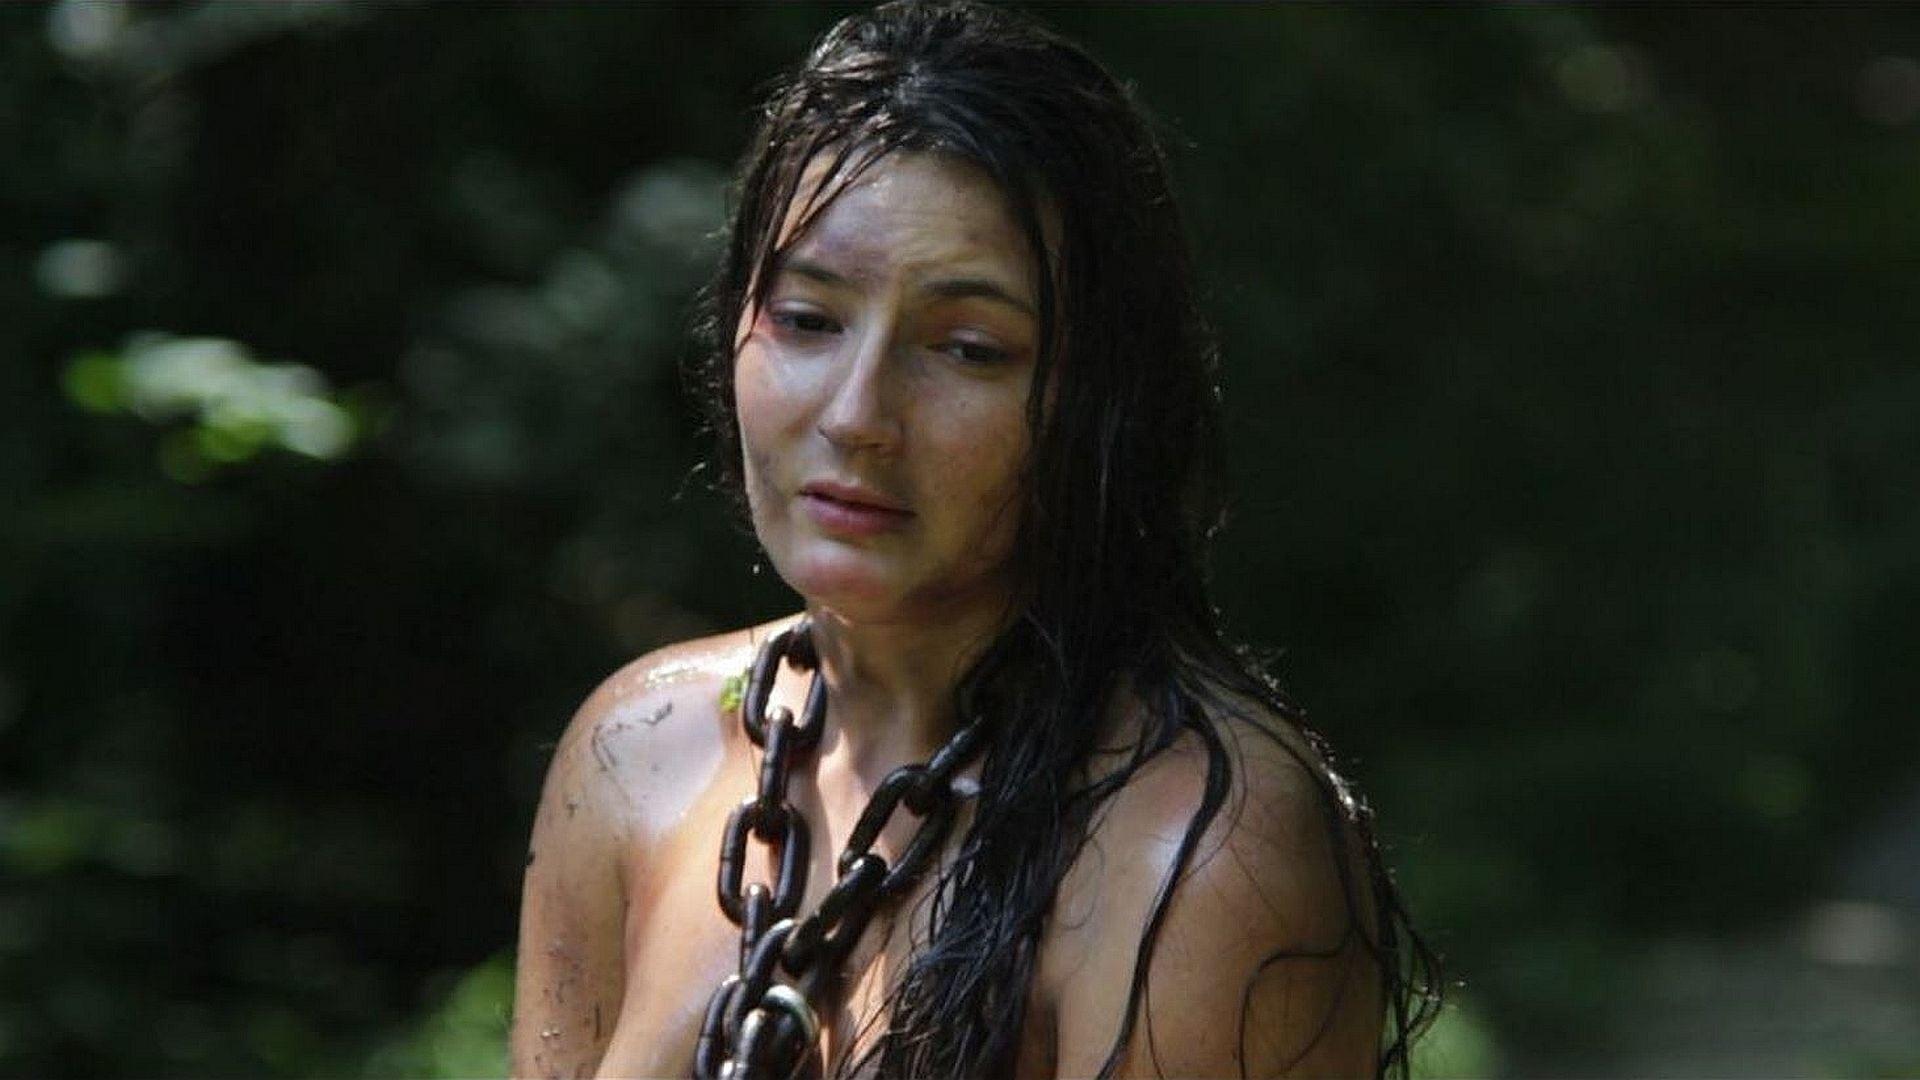 Laura L. Cottrel nude 238